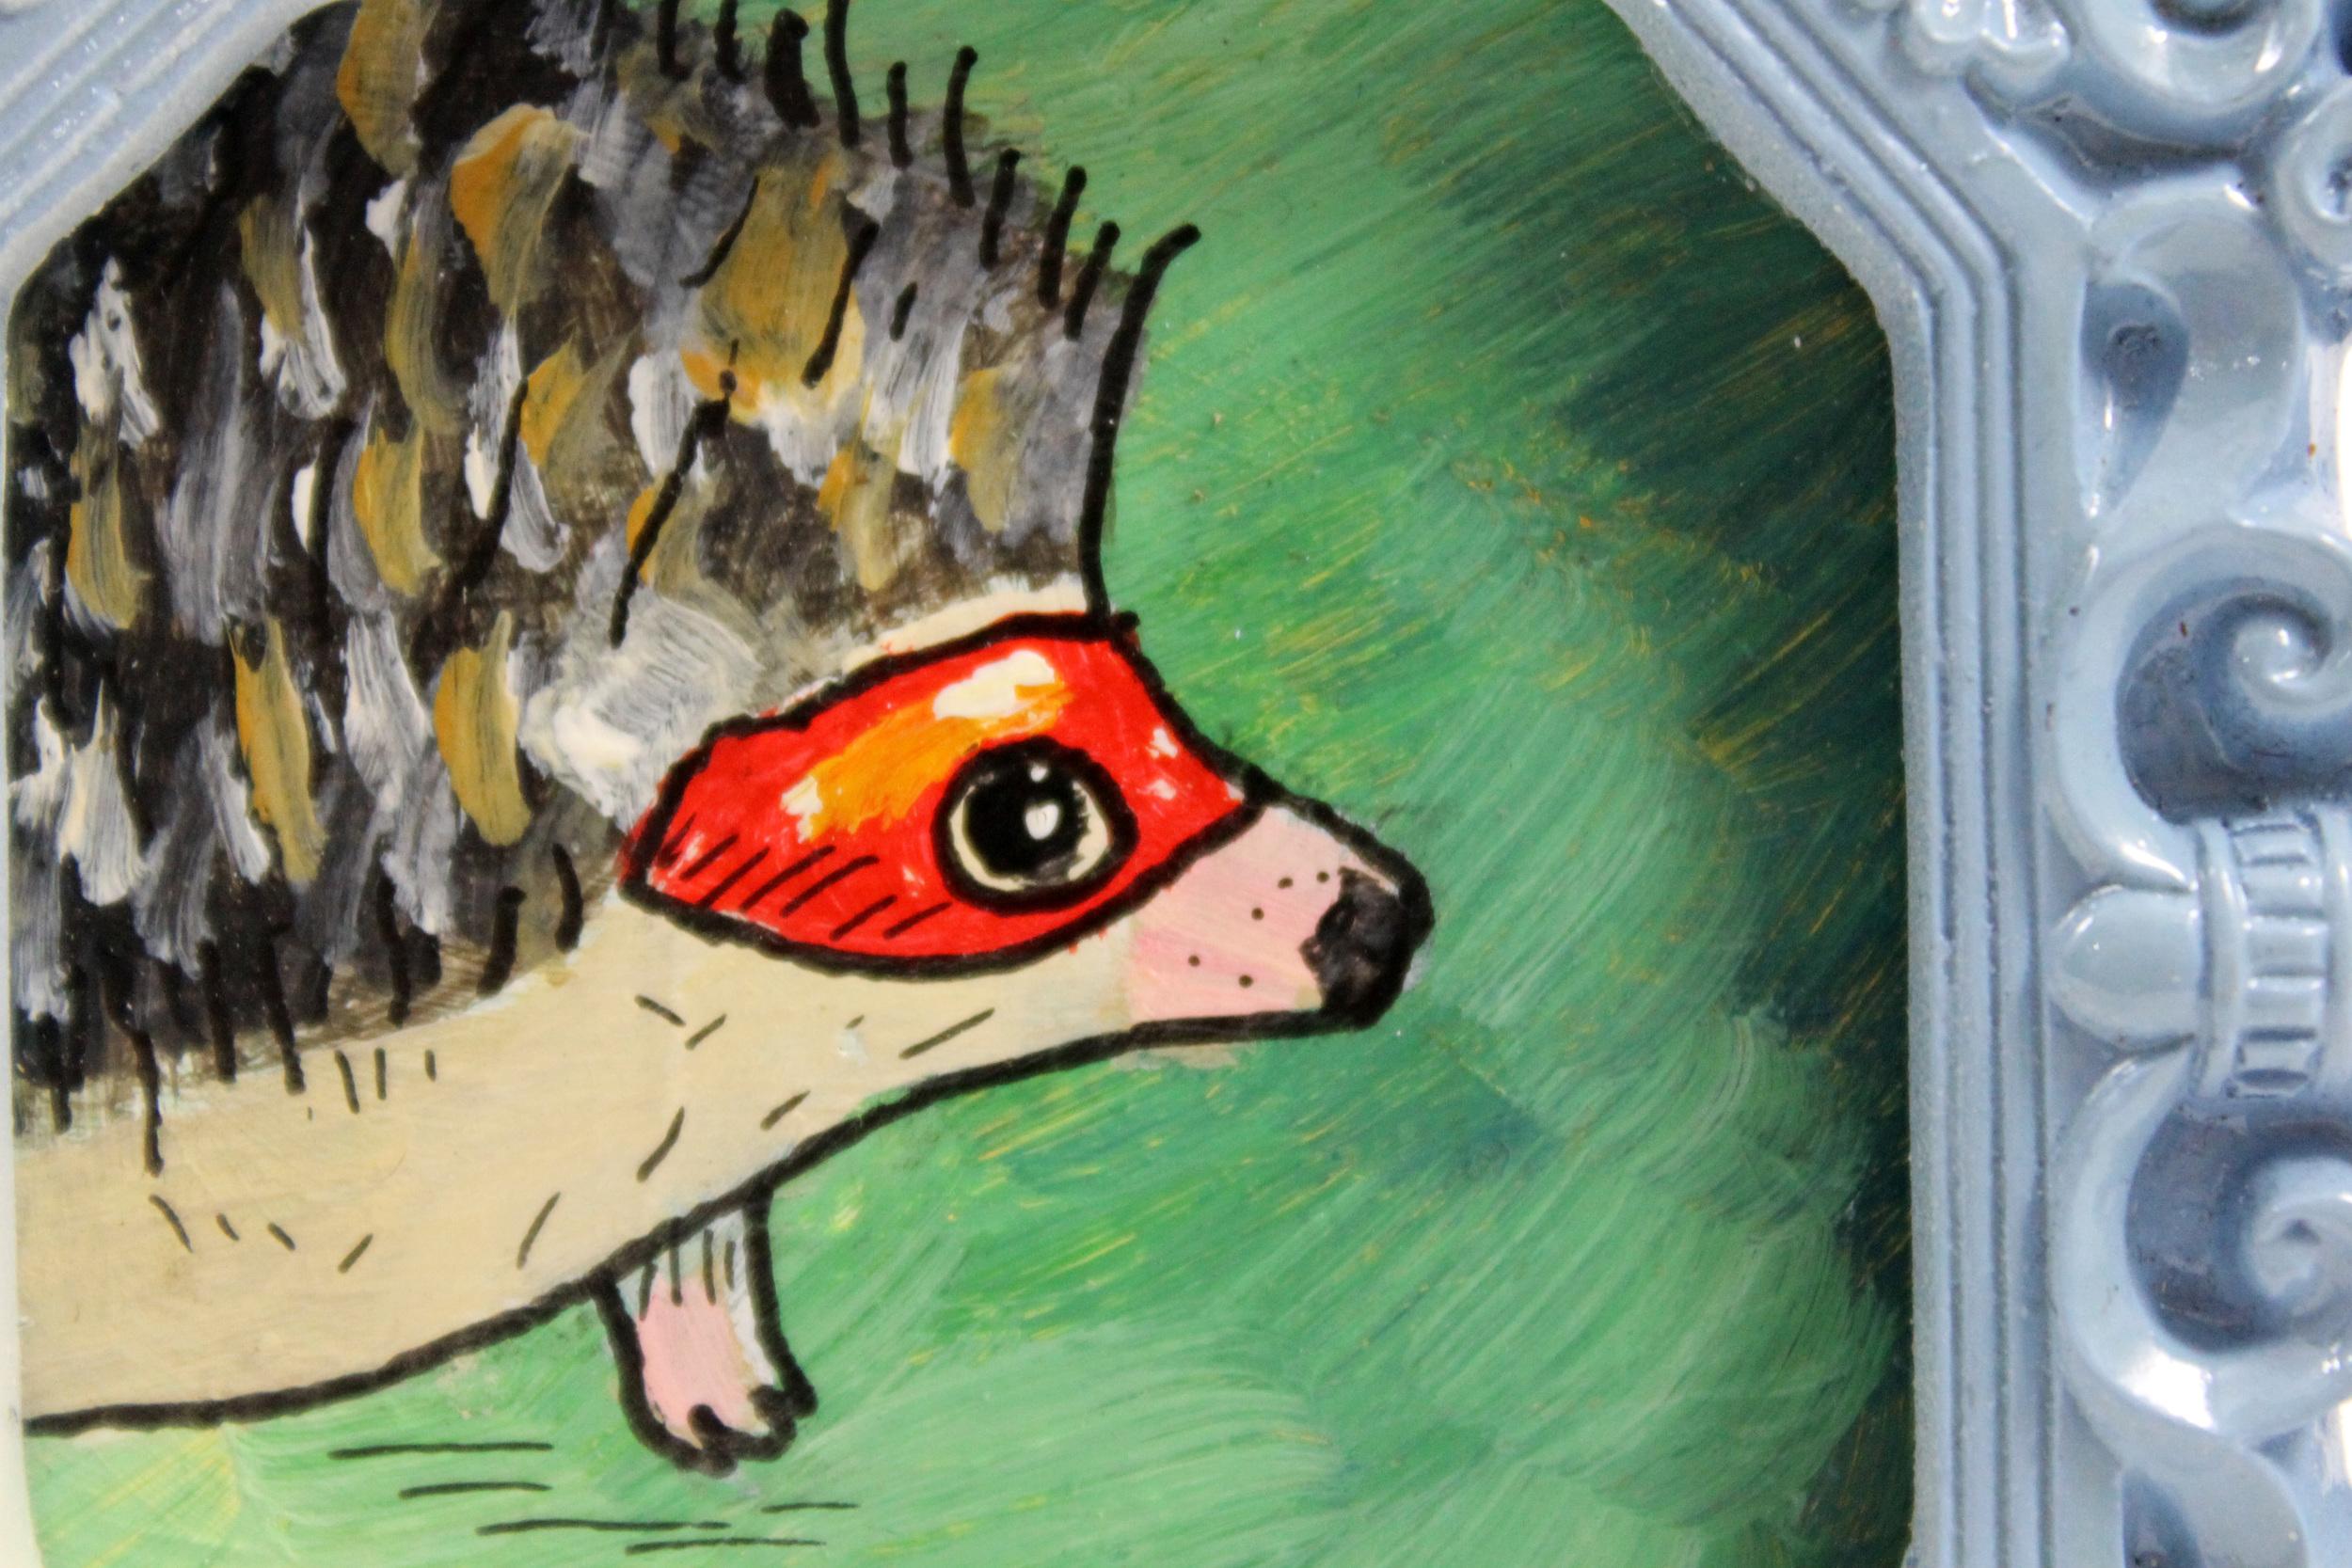 superhedgehog3.jpg